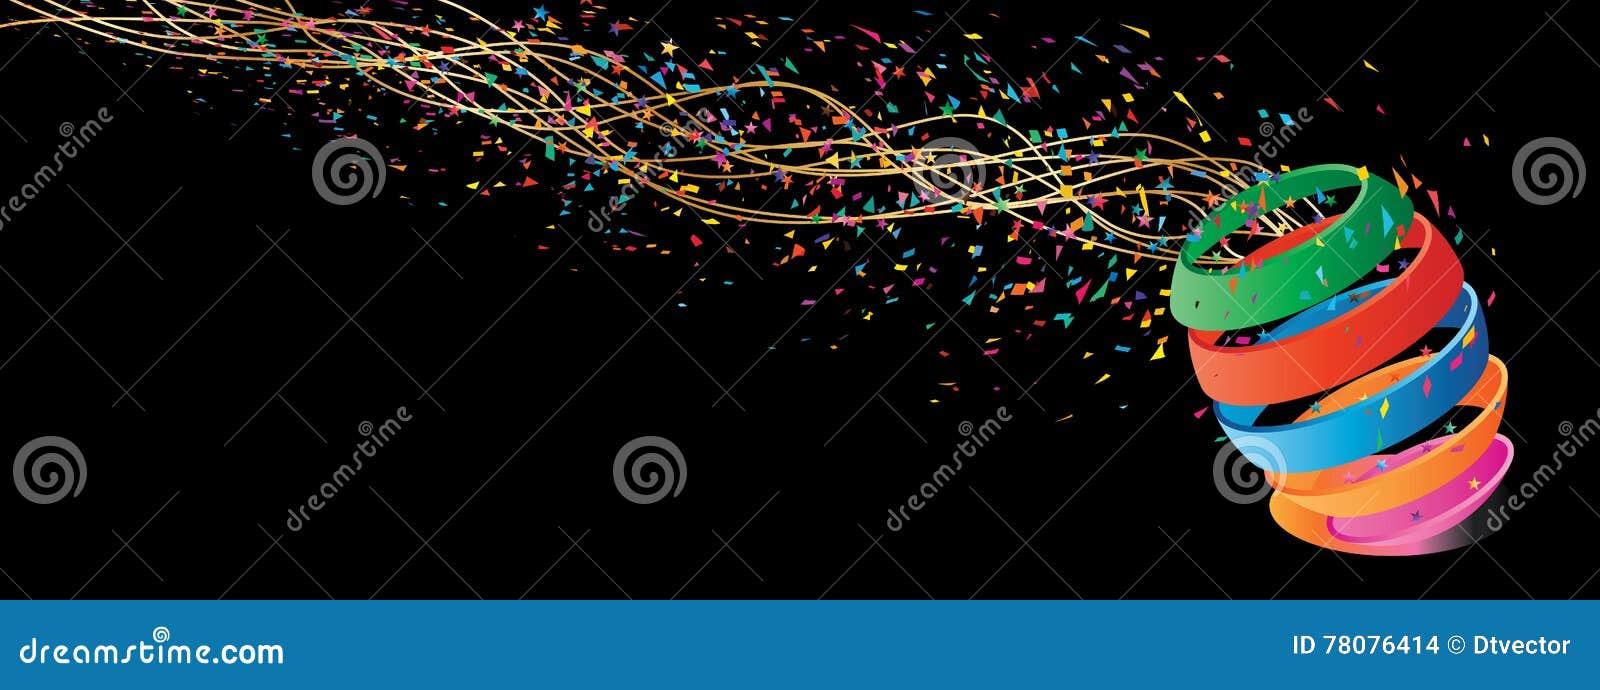 Bandeira Colorida Da Estrela Da Mosca Da Bola Foto de Stock - Imagem ... 45c5150bdc76d